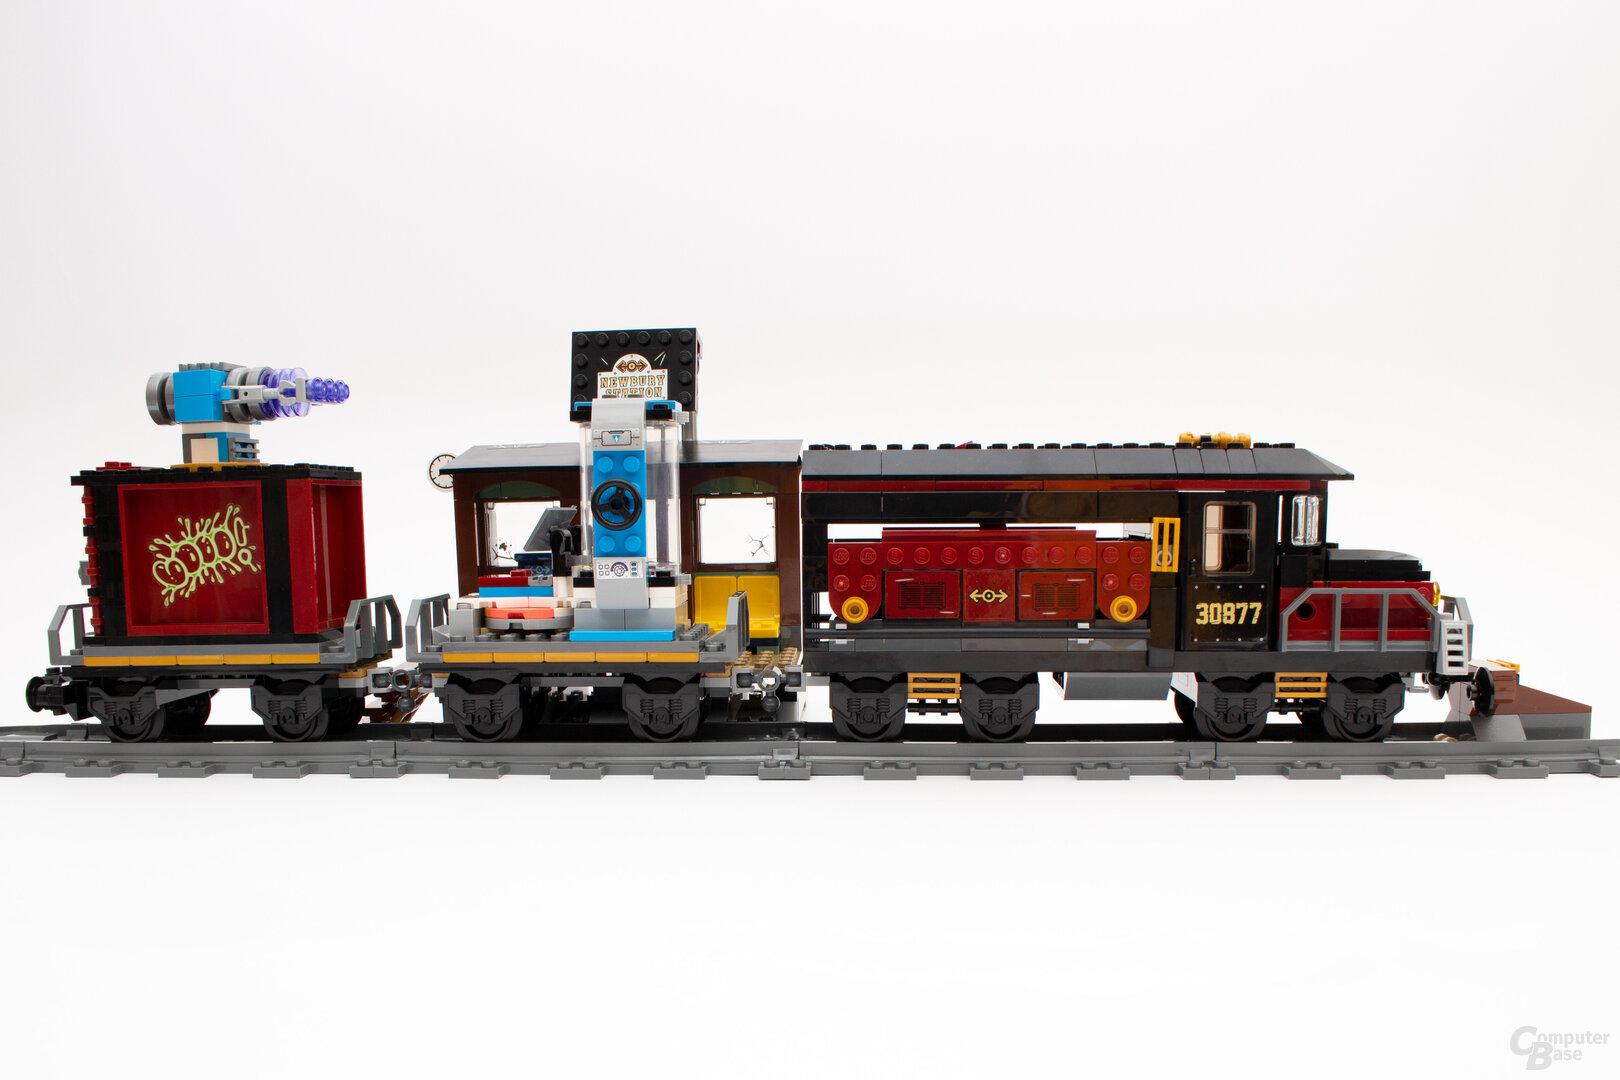 Der komplette Lego Hidden Side Geister-Express